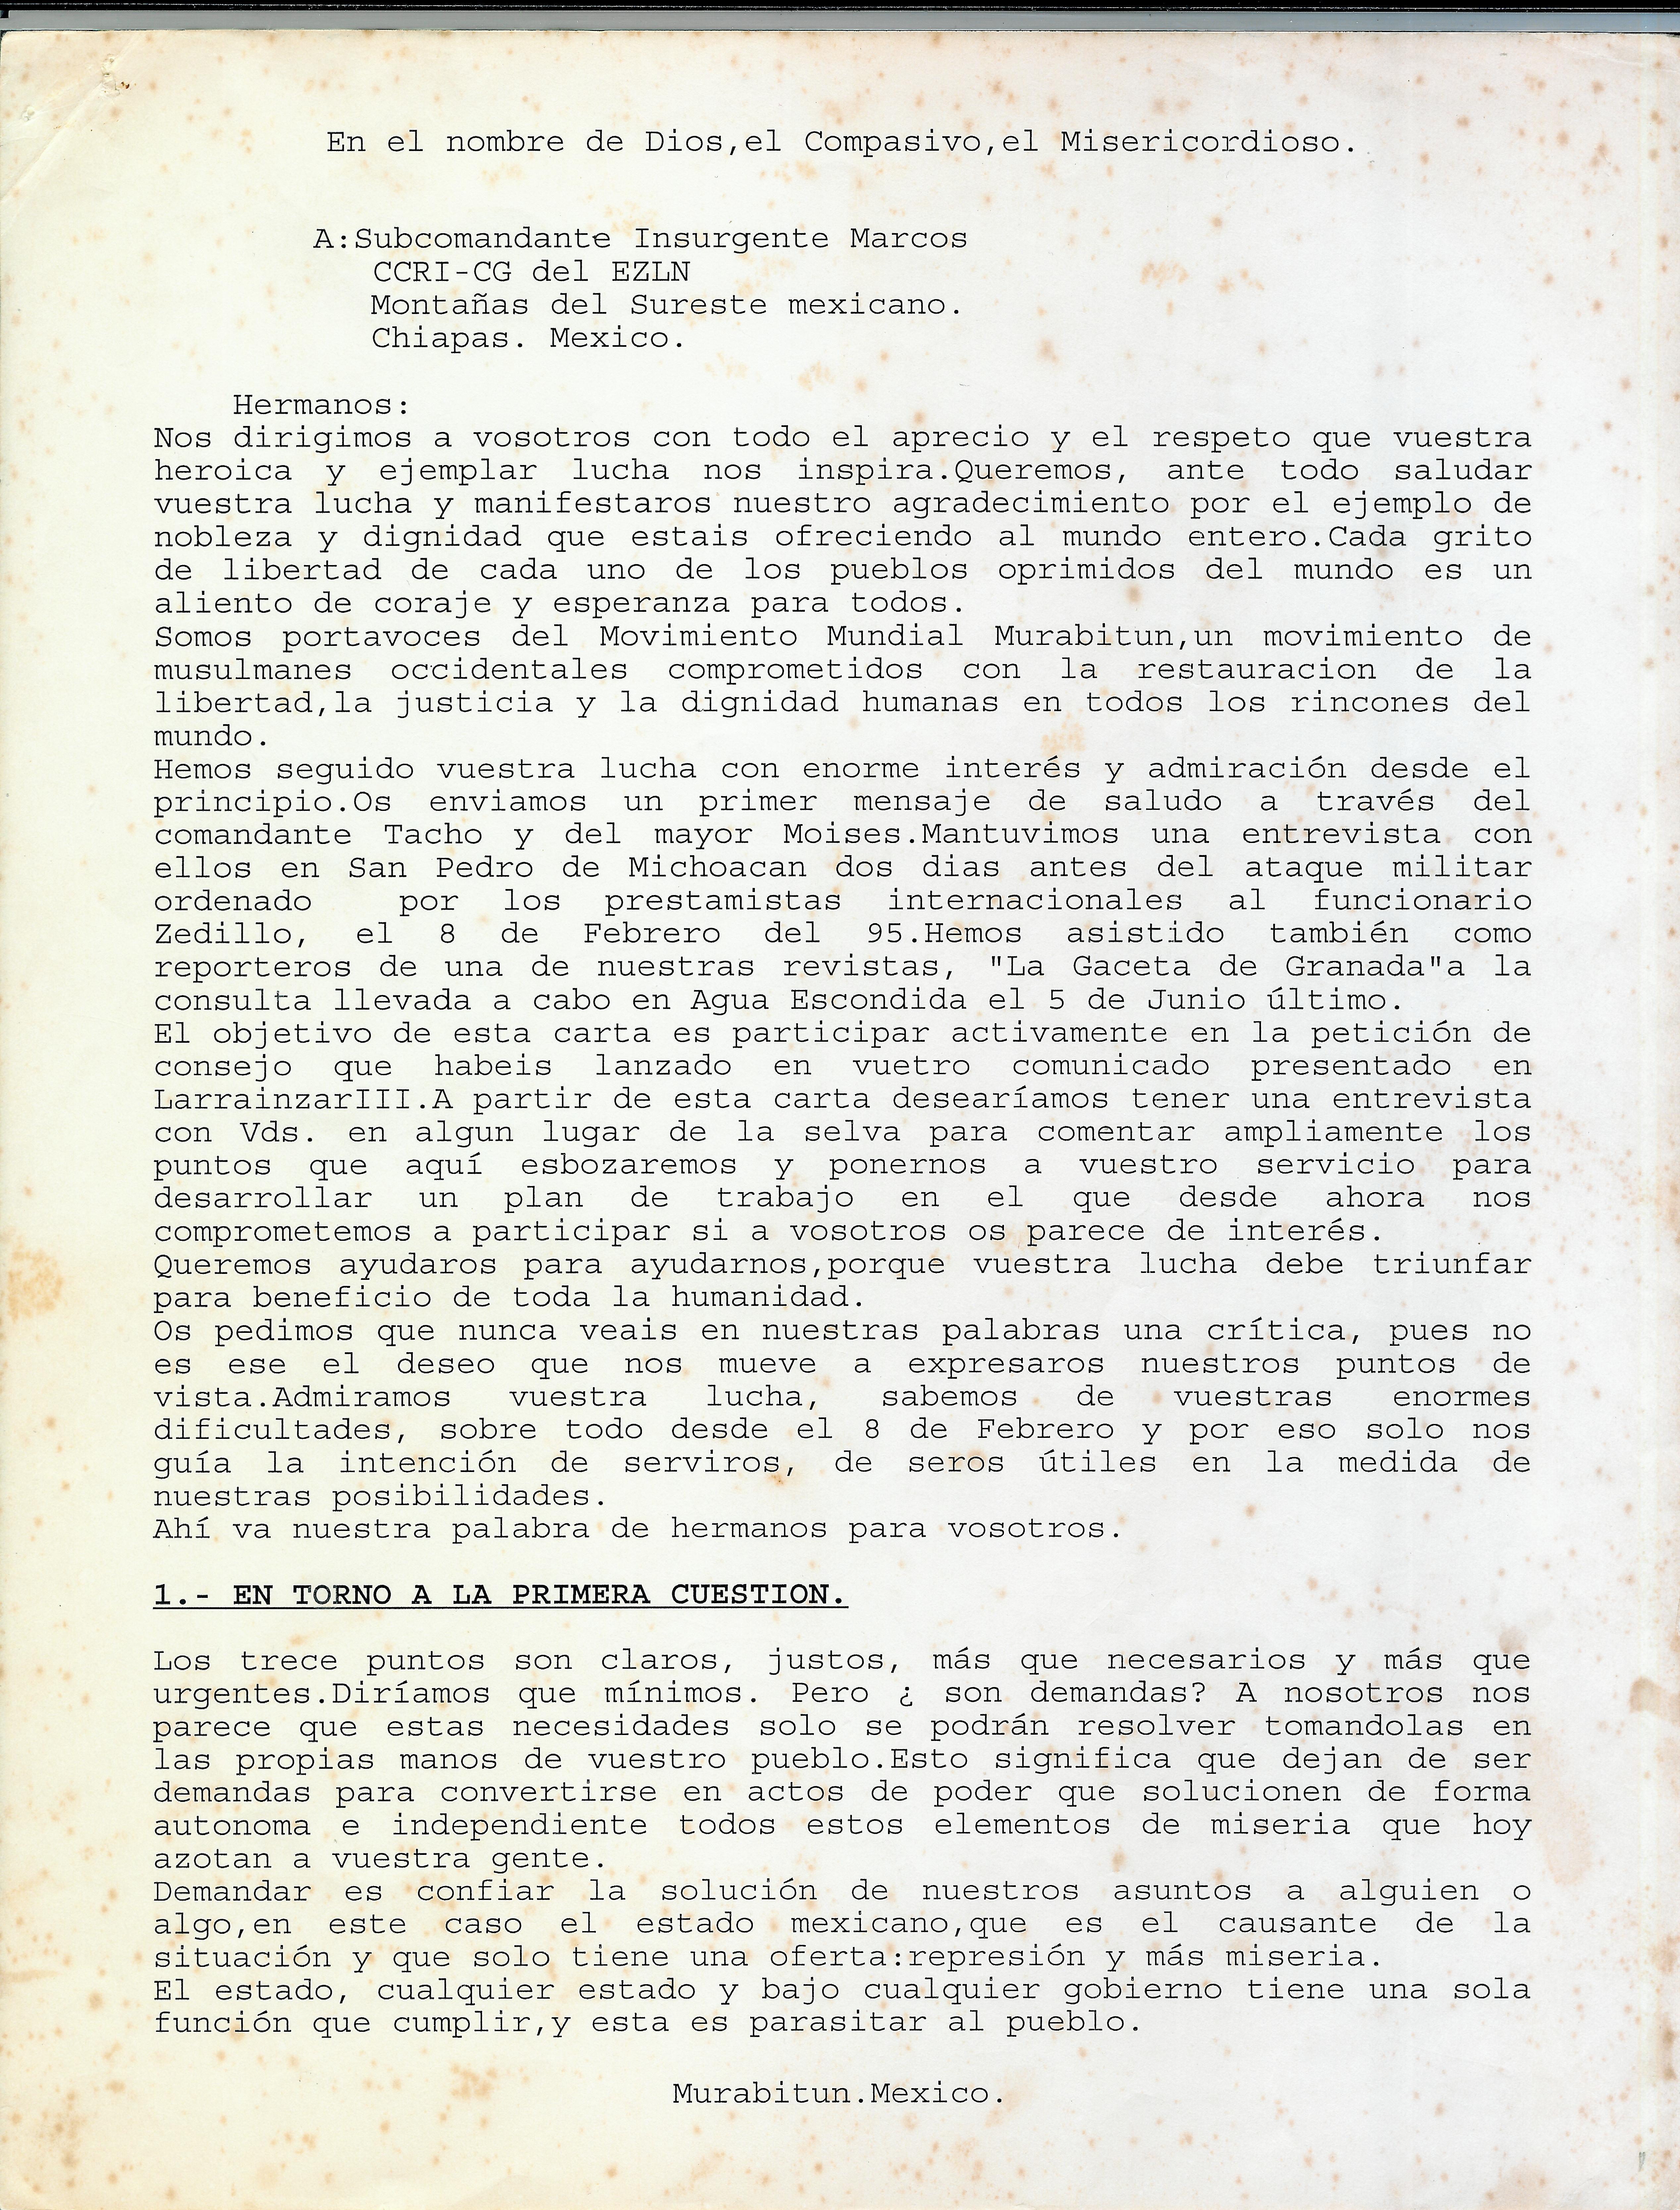 Carta Murabitun a Marcos. Foto: Archivo Gaspar Morquecho